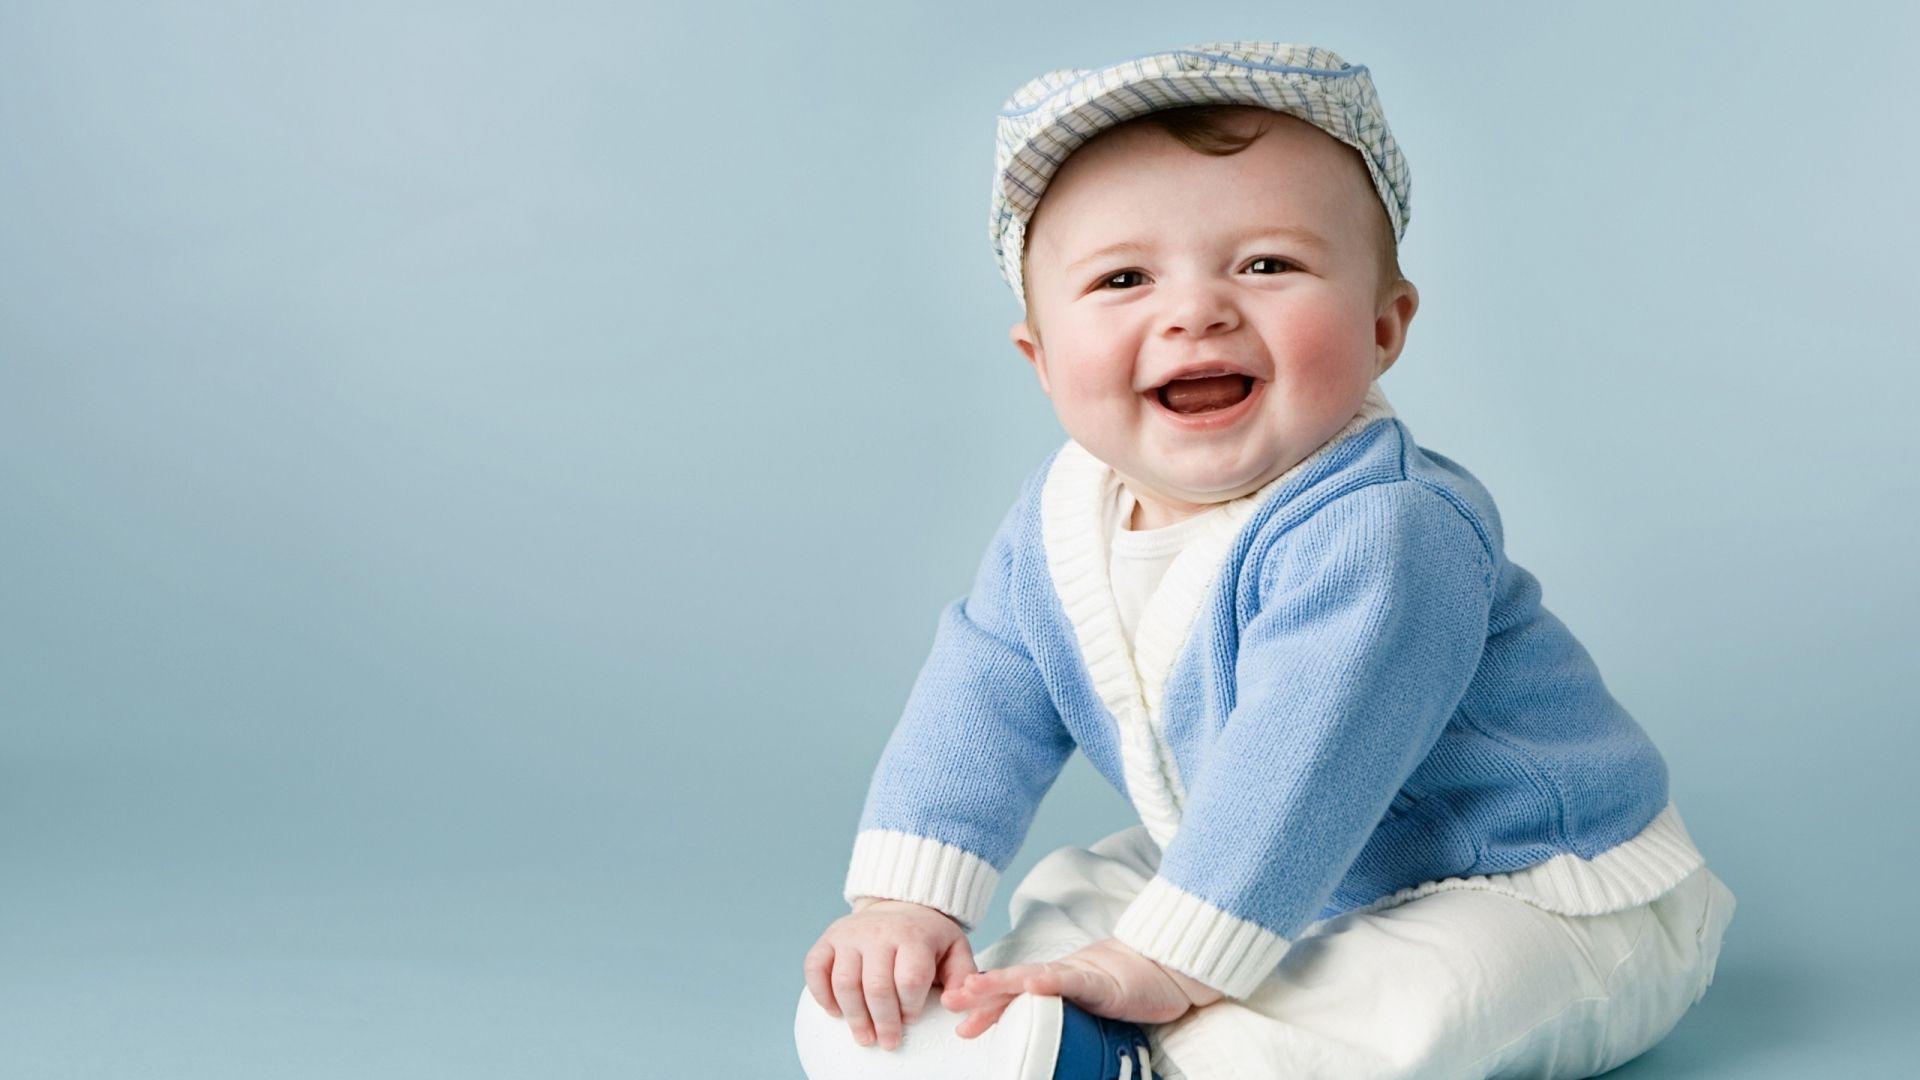 Funny Baby Wallpaper